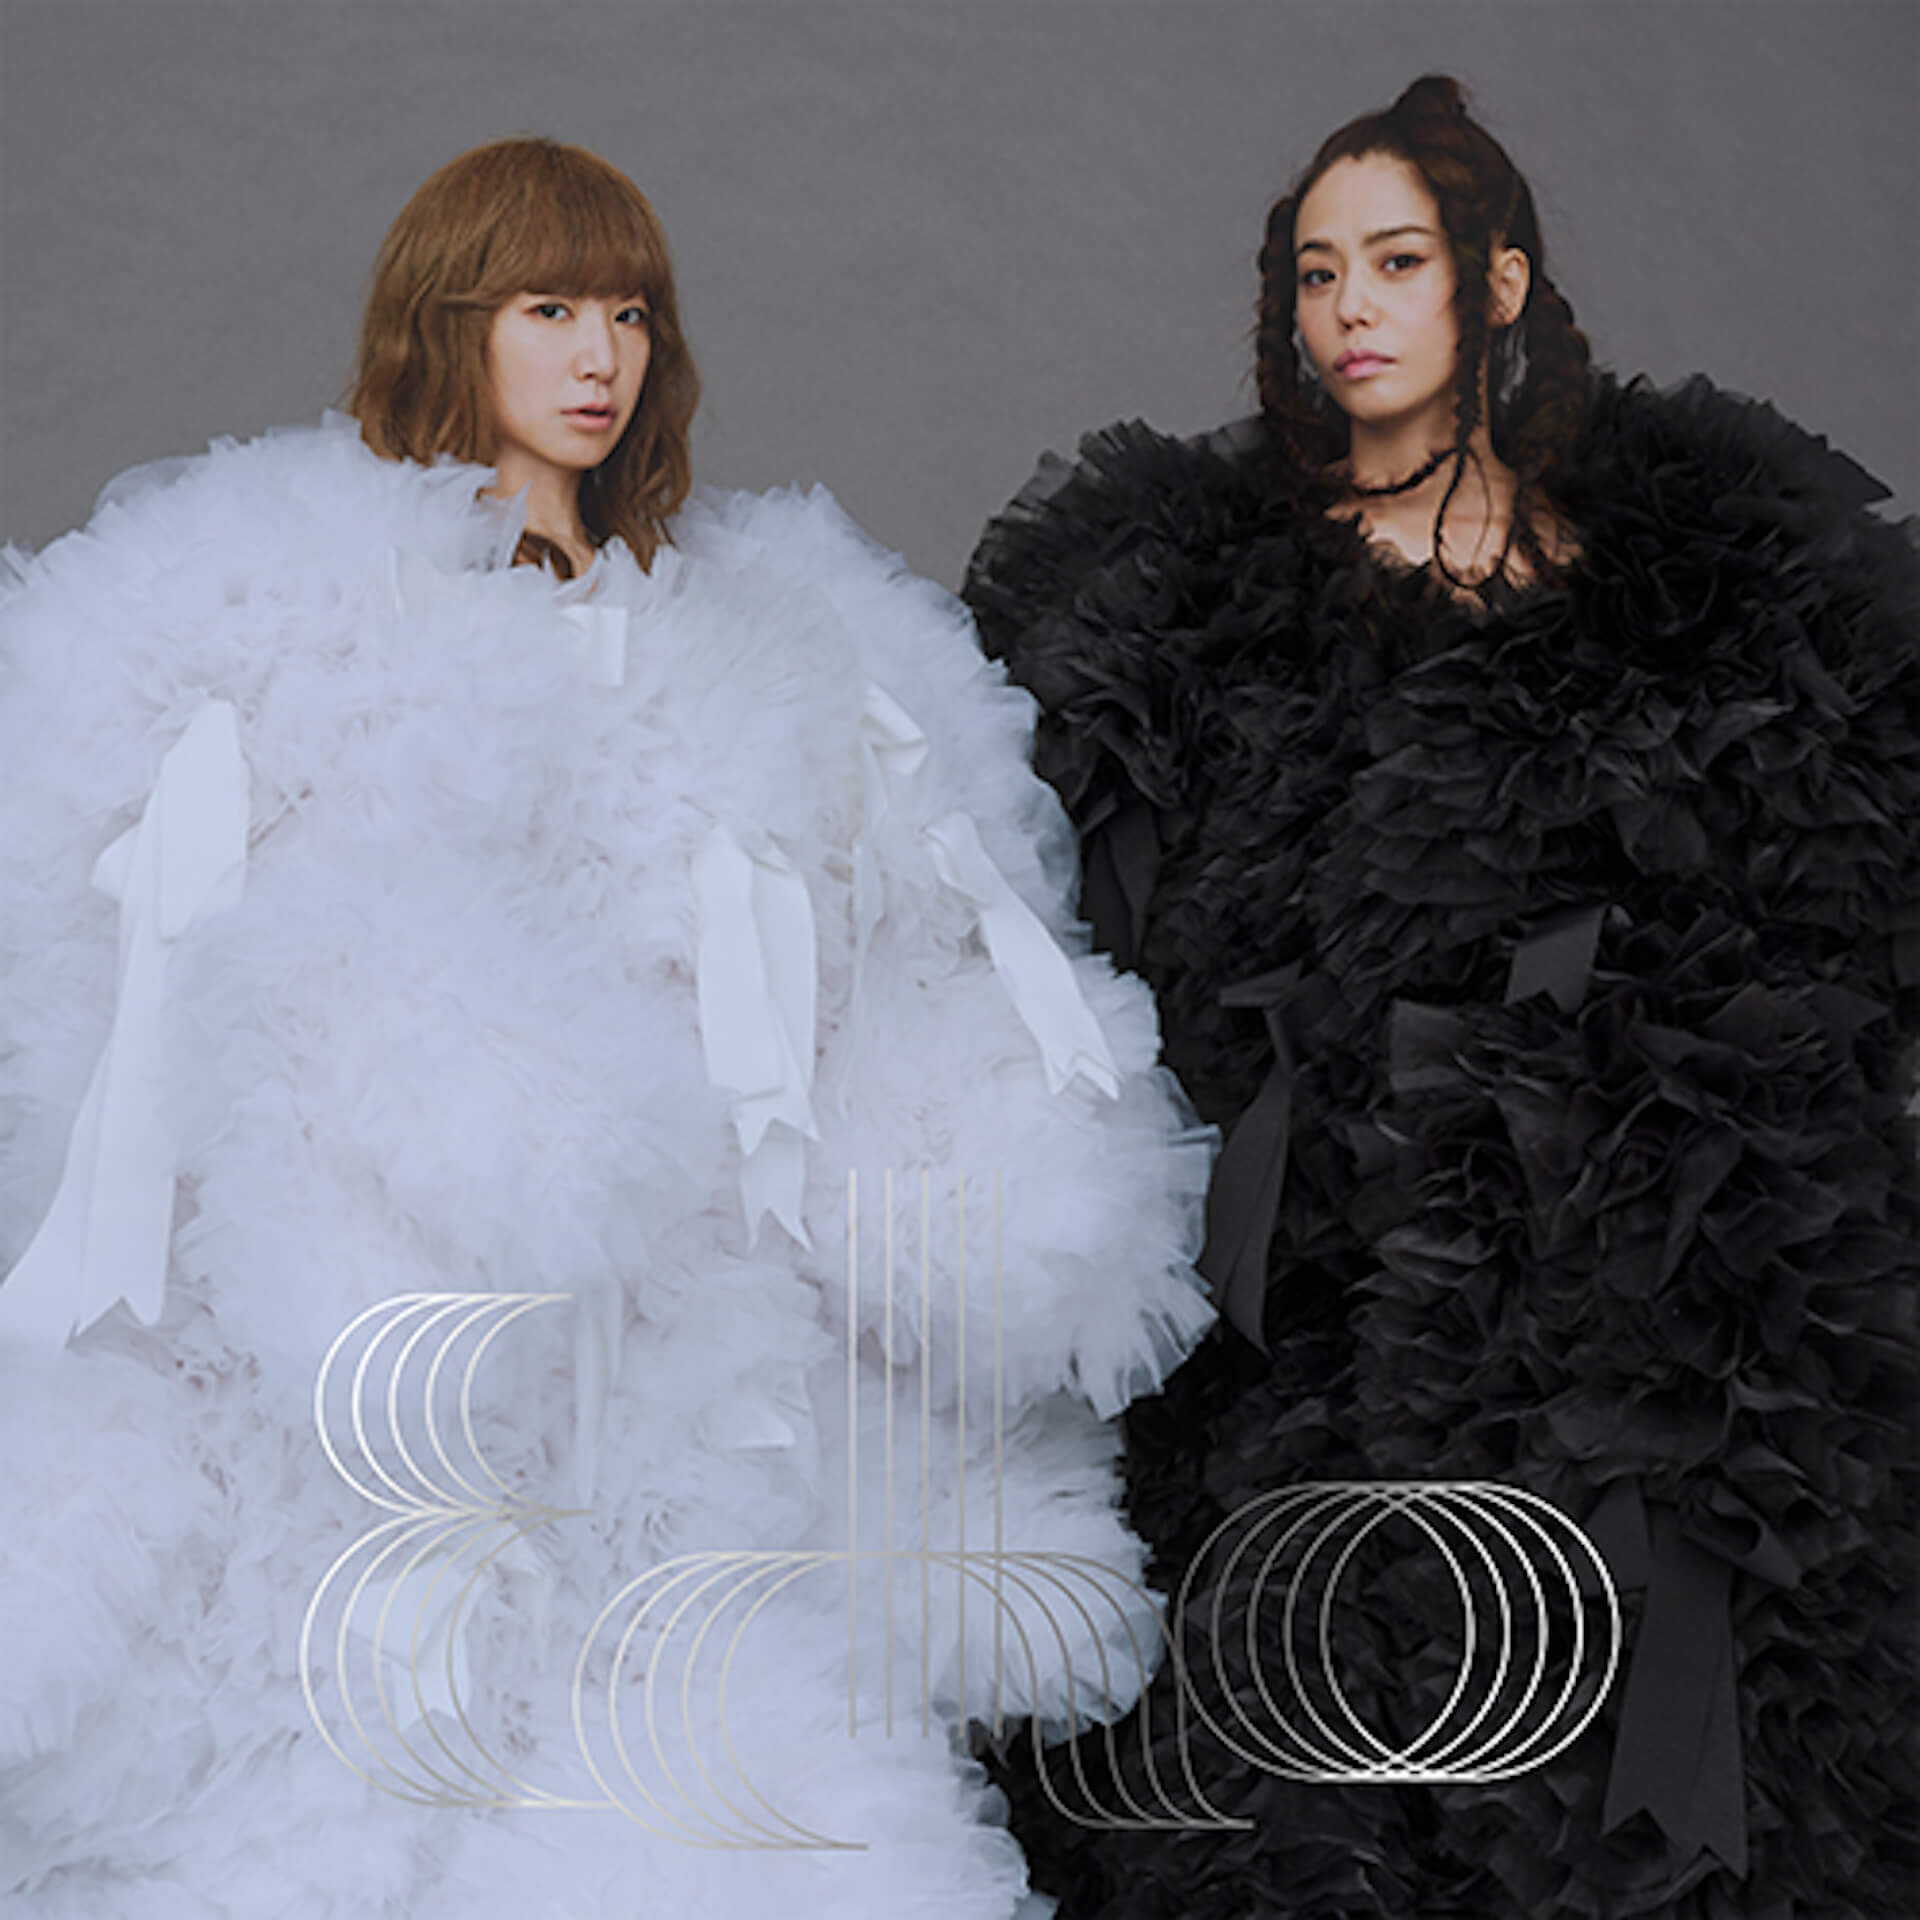 Chara+YUKI、新シングル&ミニアルバムのジャケット写真&収録曲が決定!オフィシャルサイトにはふたりのインタビューも music200110_charayuki_4